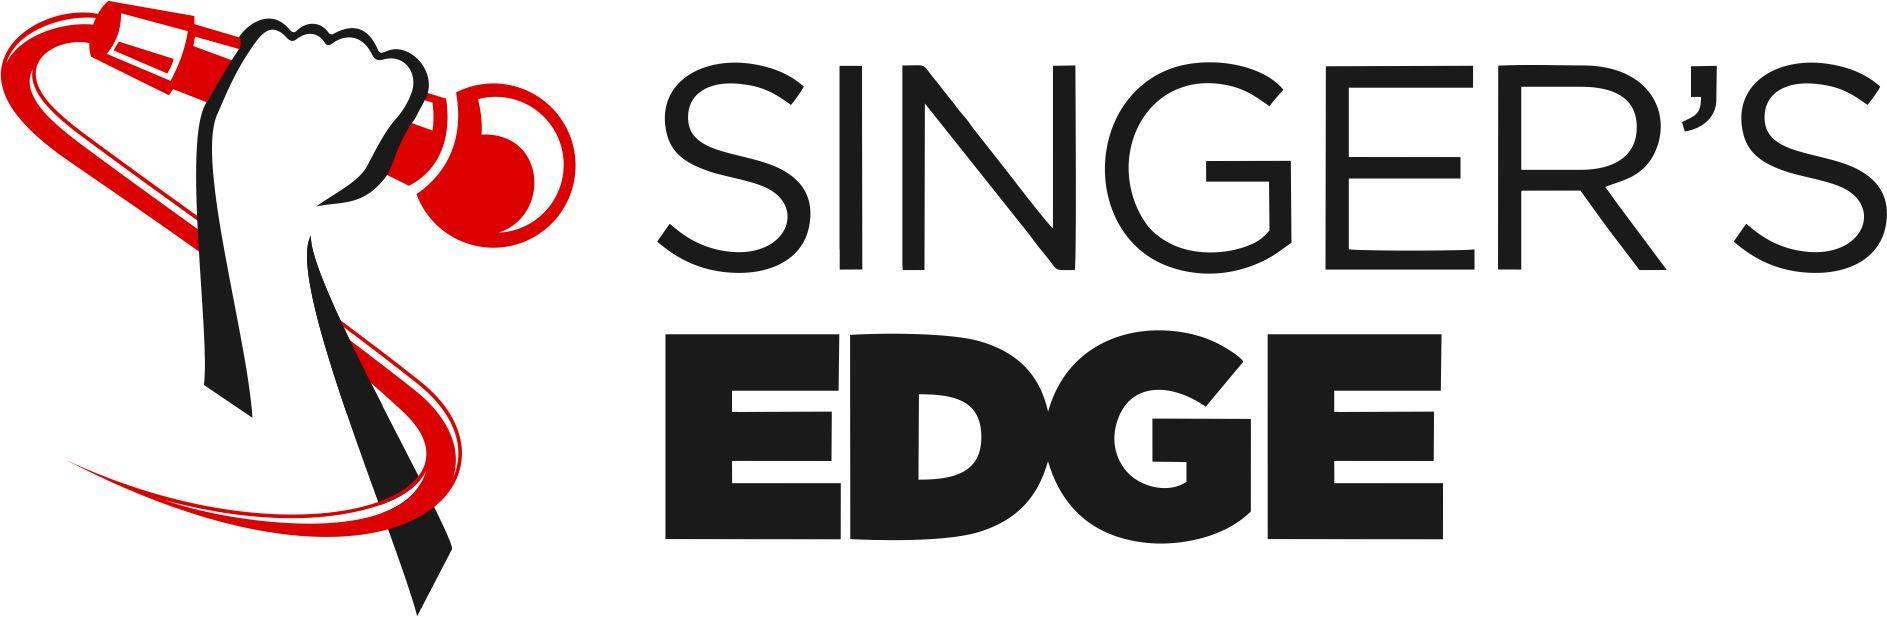 cropped-Singers-Edge_Final-01-1.jpg